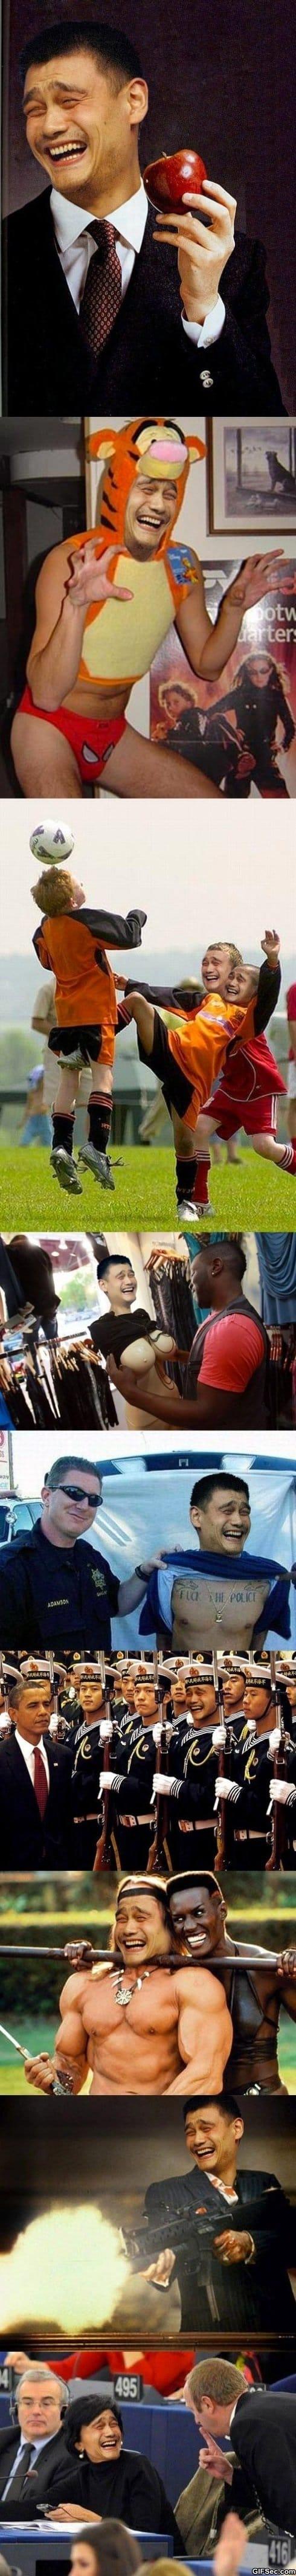 Yao Ming 1 meme lol memes